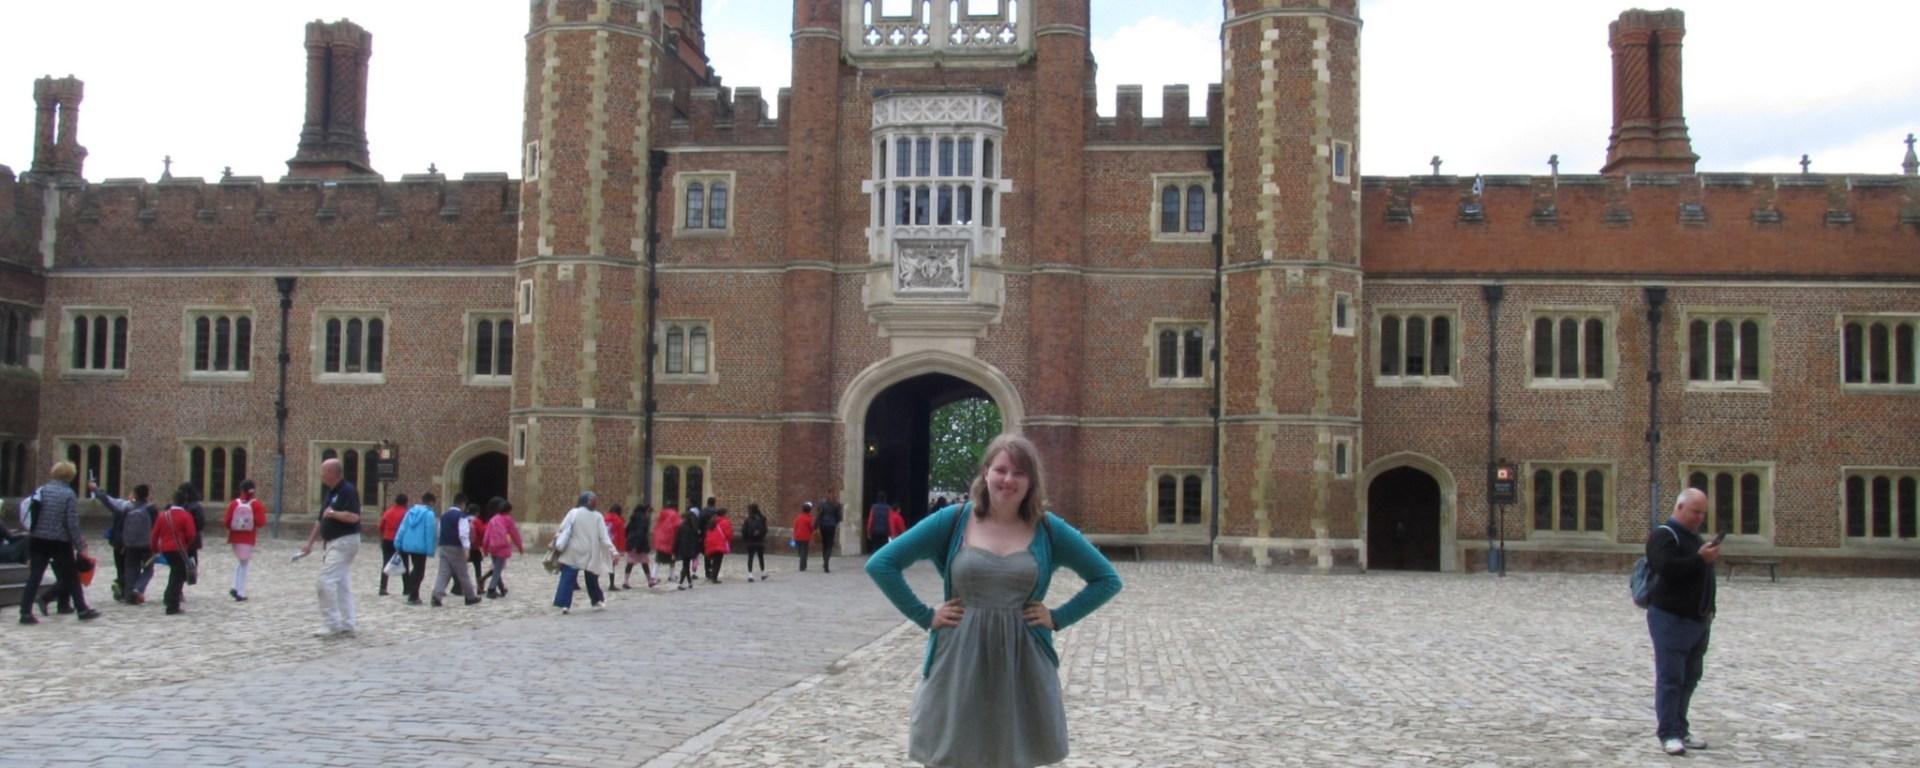 Hampton Court Palace, London